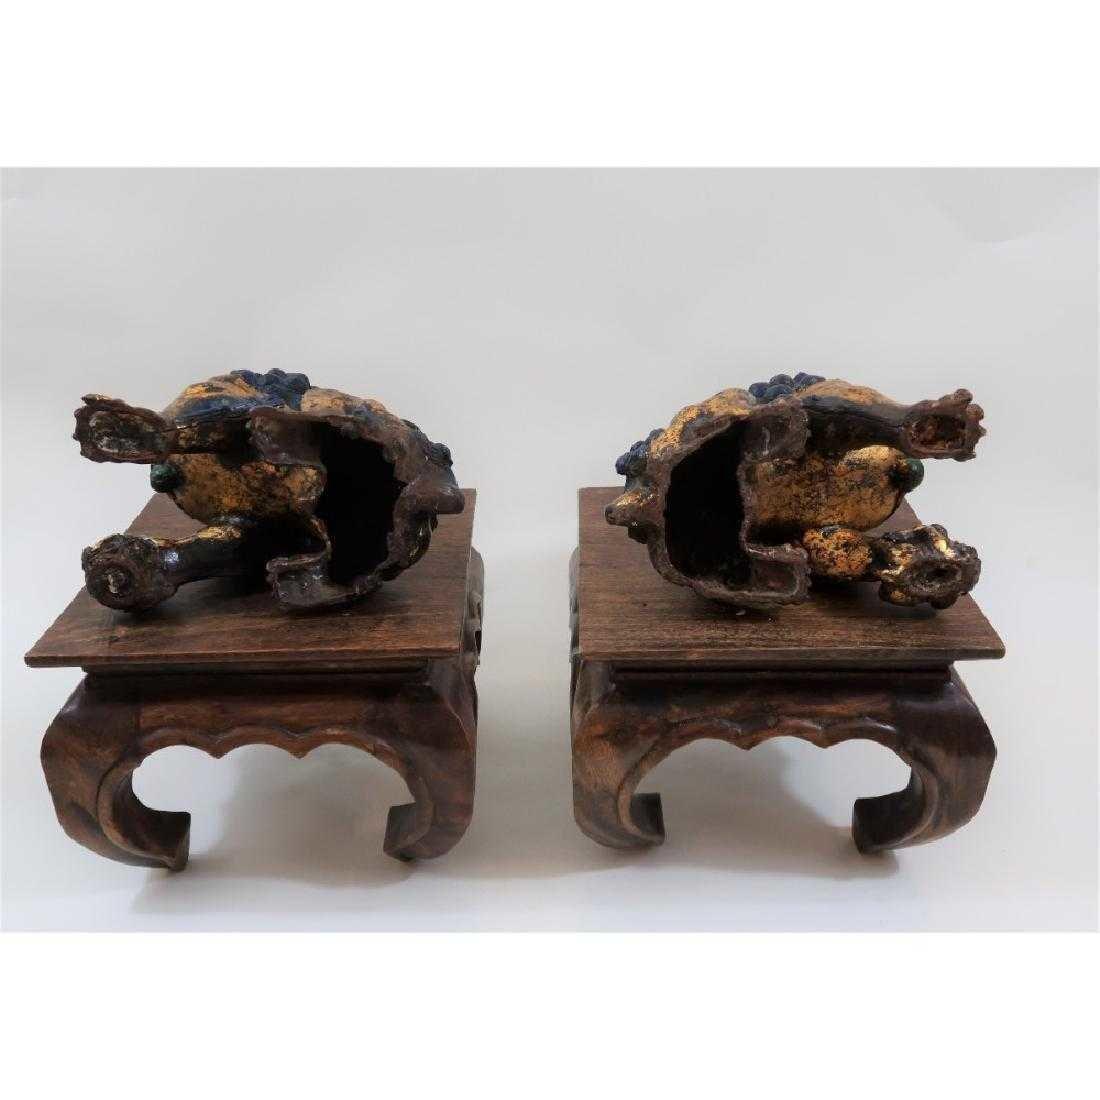 Pair of iron foo dogs 1800s - 4